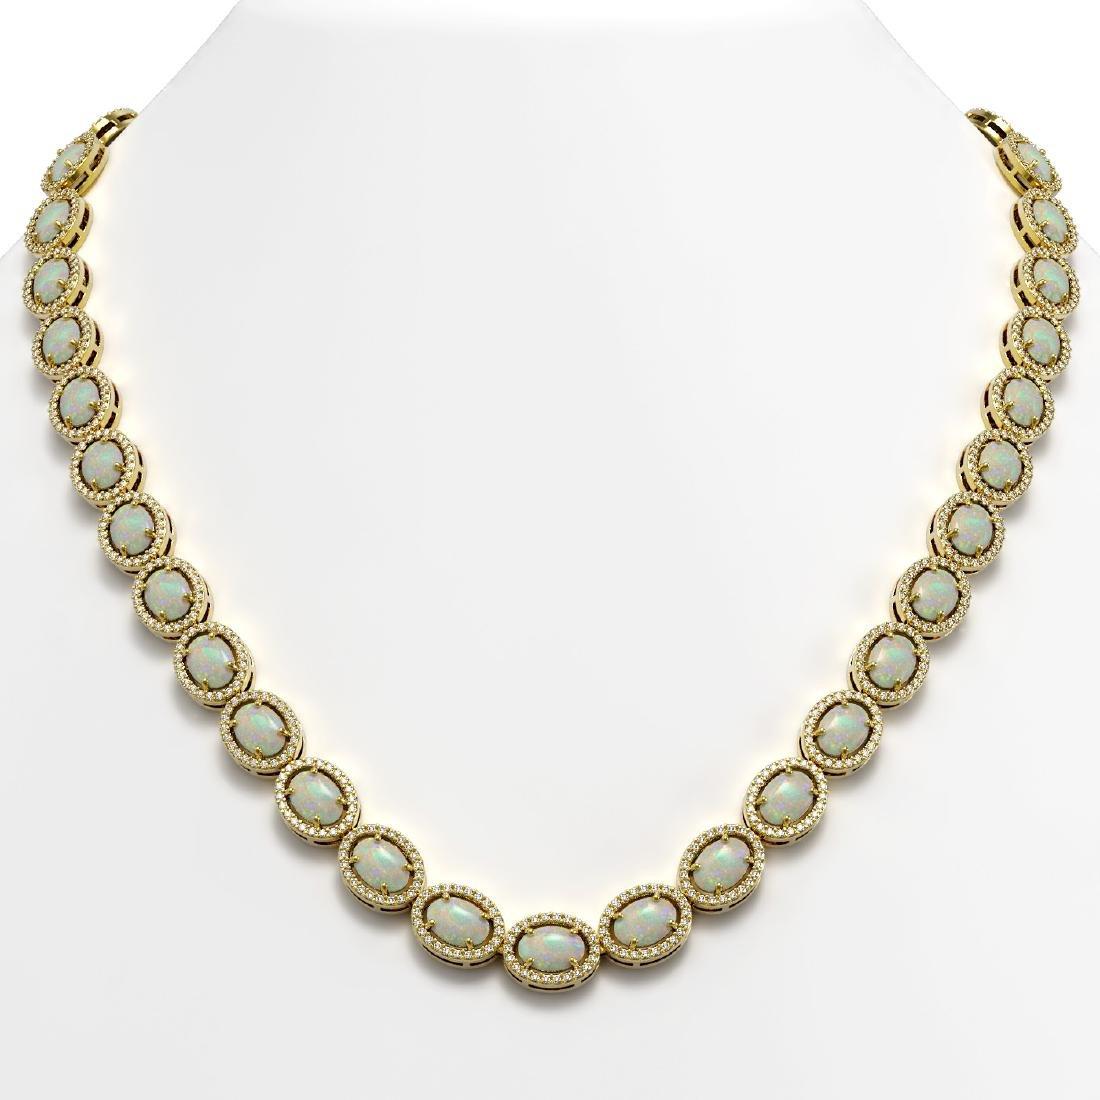 32.42 CTW Opal & Diamond Halo Necklace 10K Yellow Gold